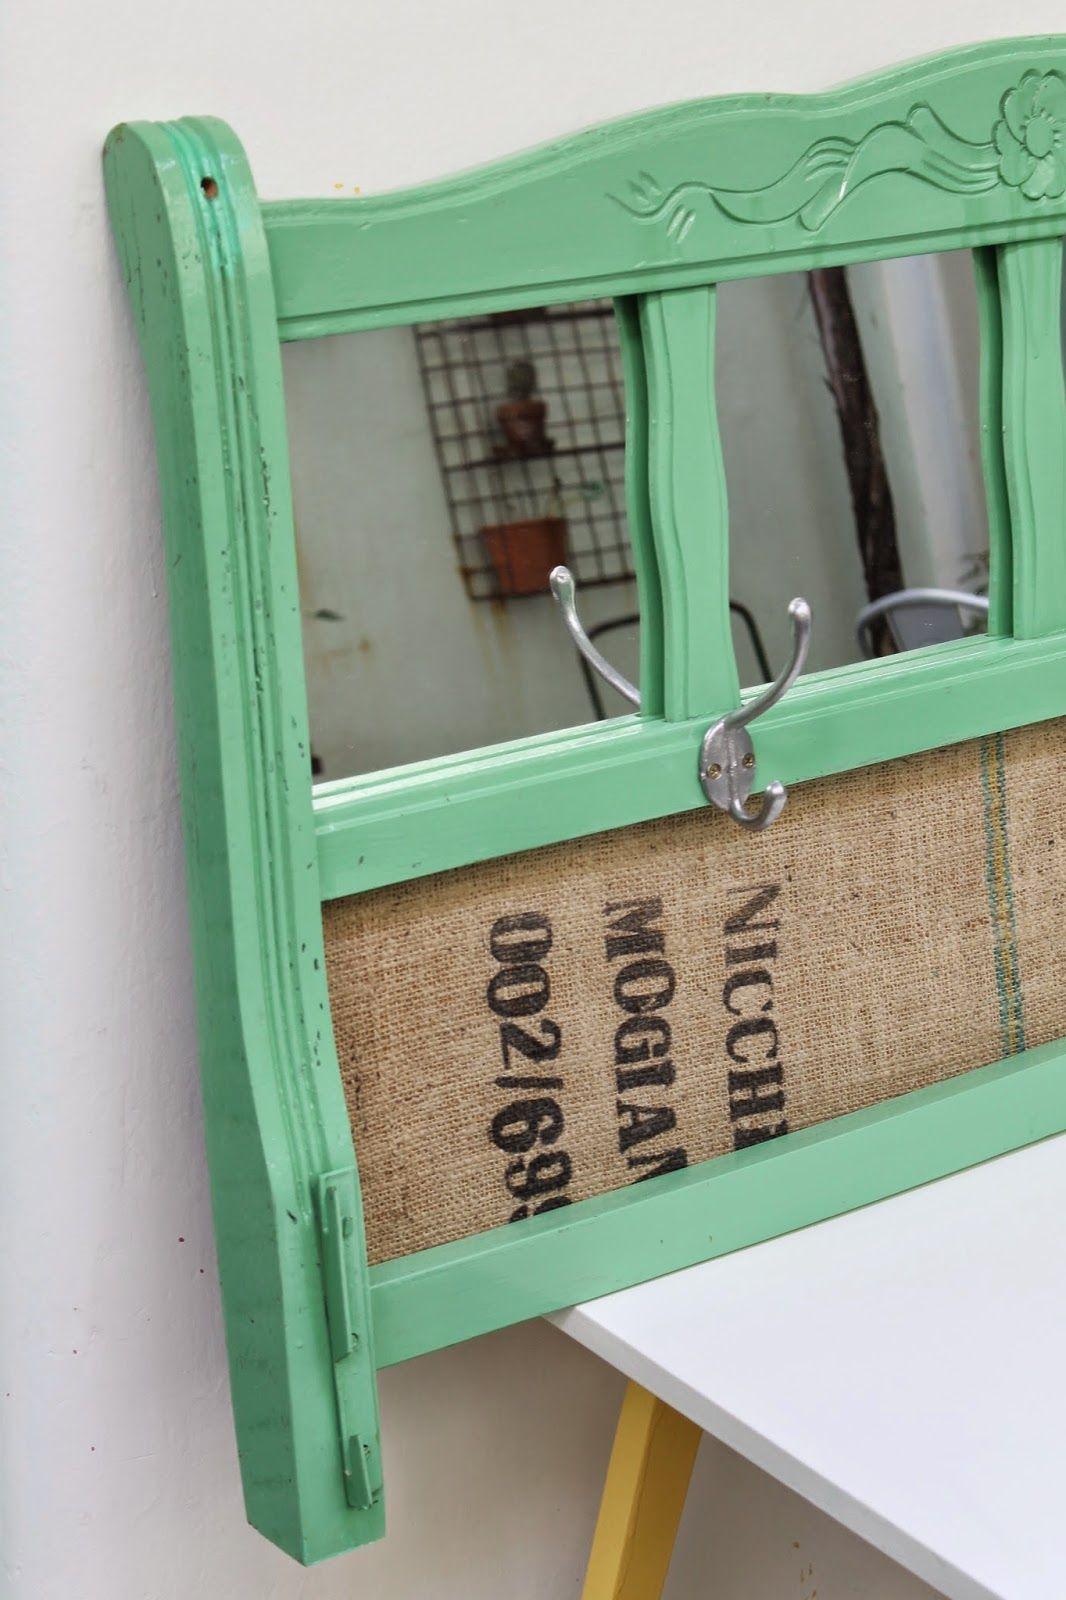 Perchero de pared: Deco Marce Tienda | DECORACION | Pinterest ...